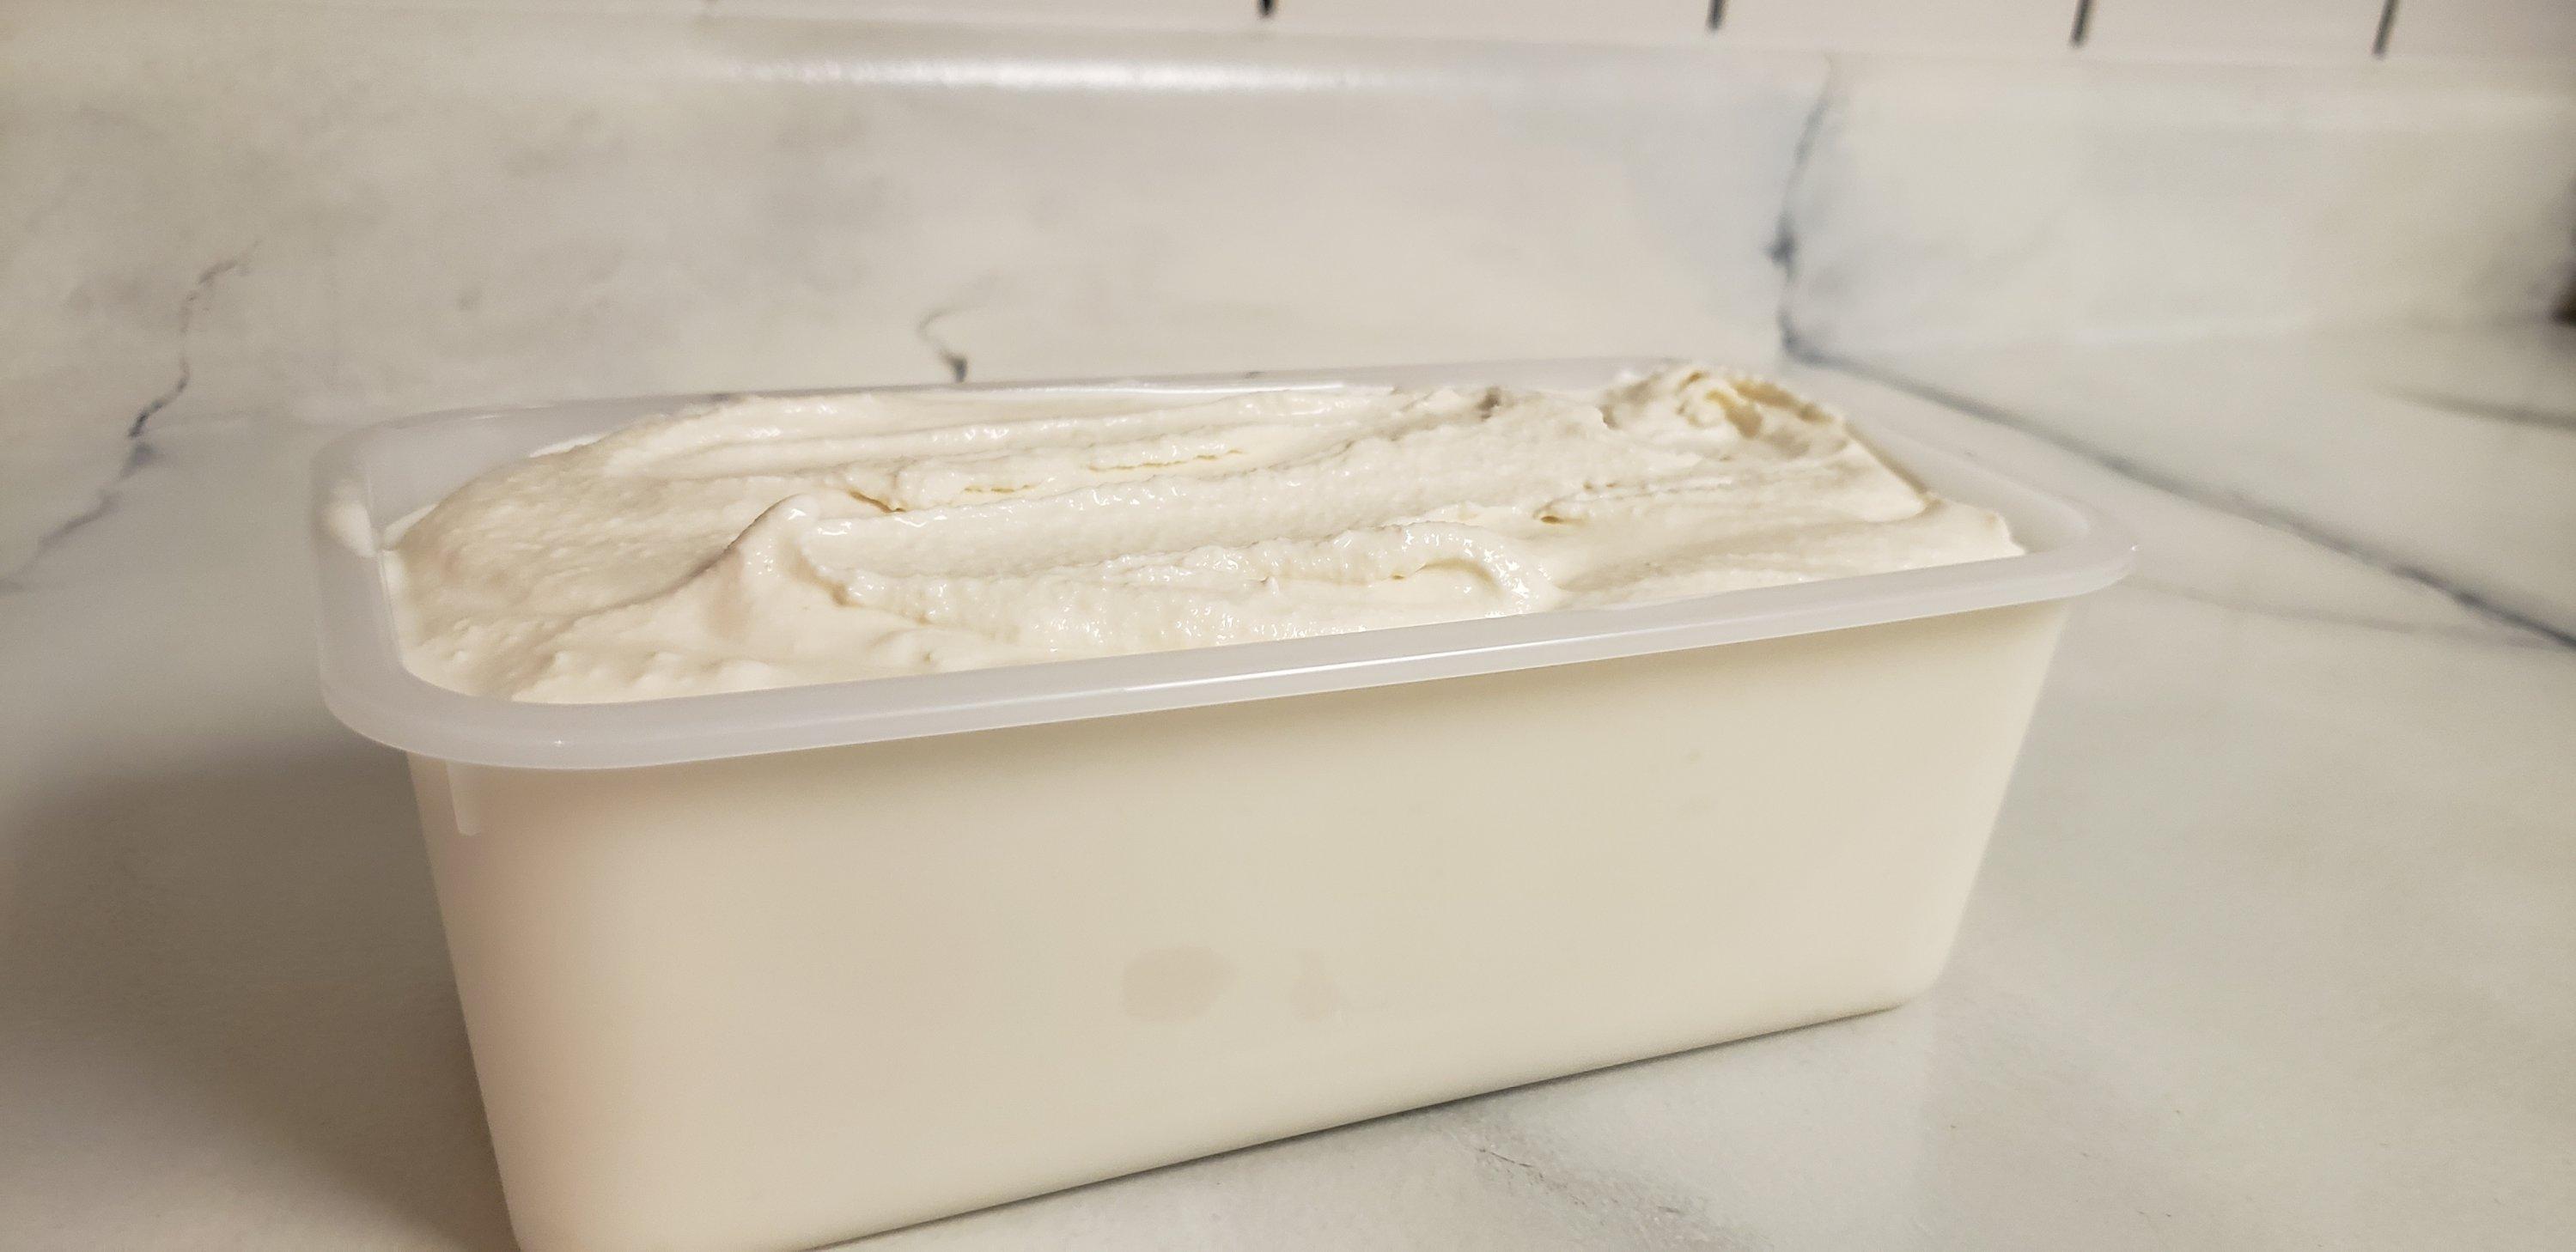 Ice cream in the container